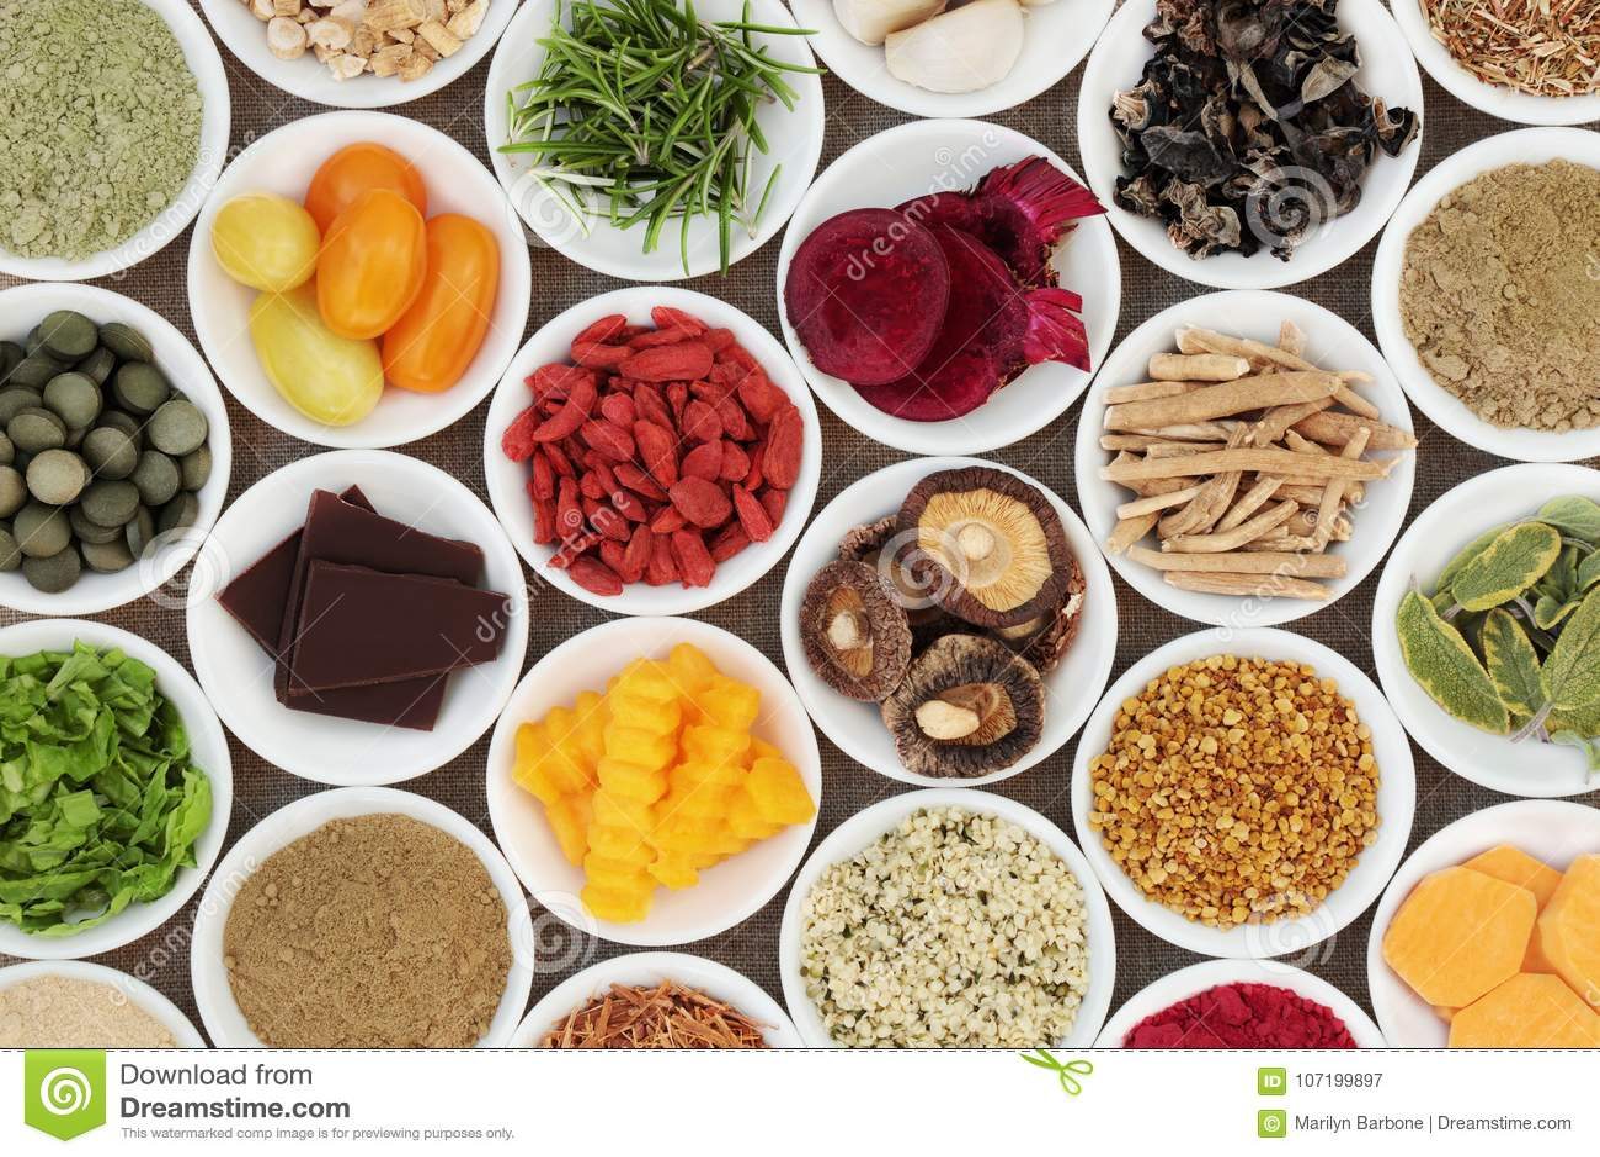 Brain Boosting Health Food